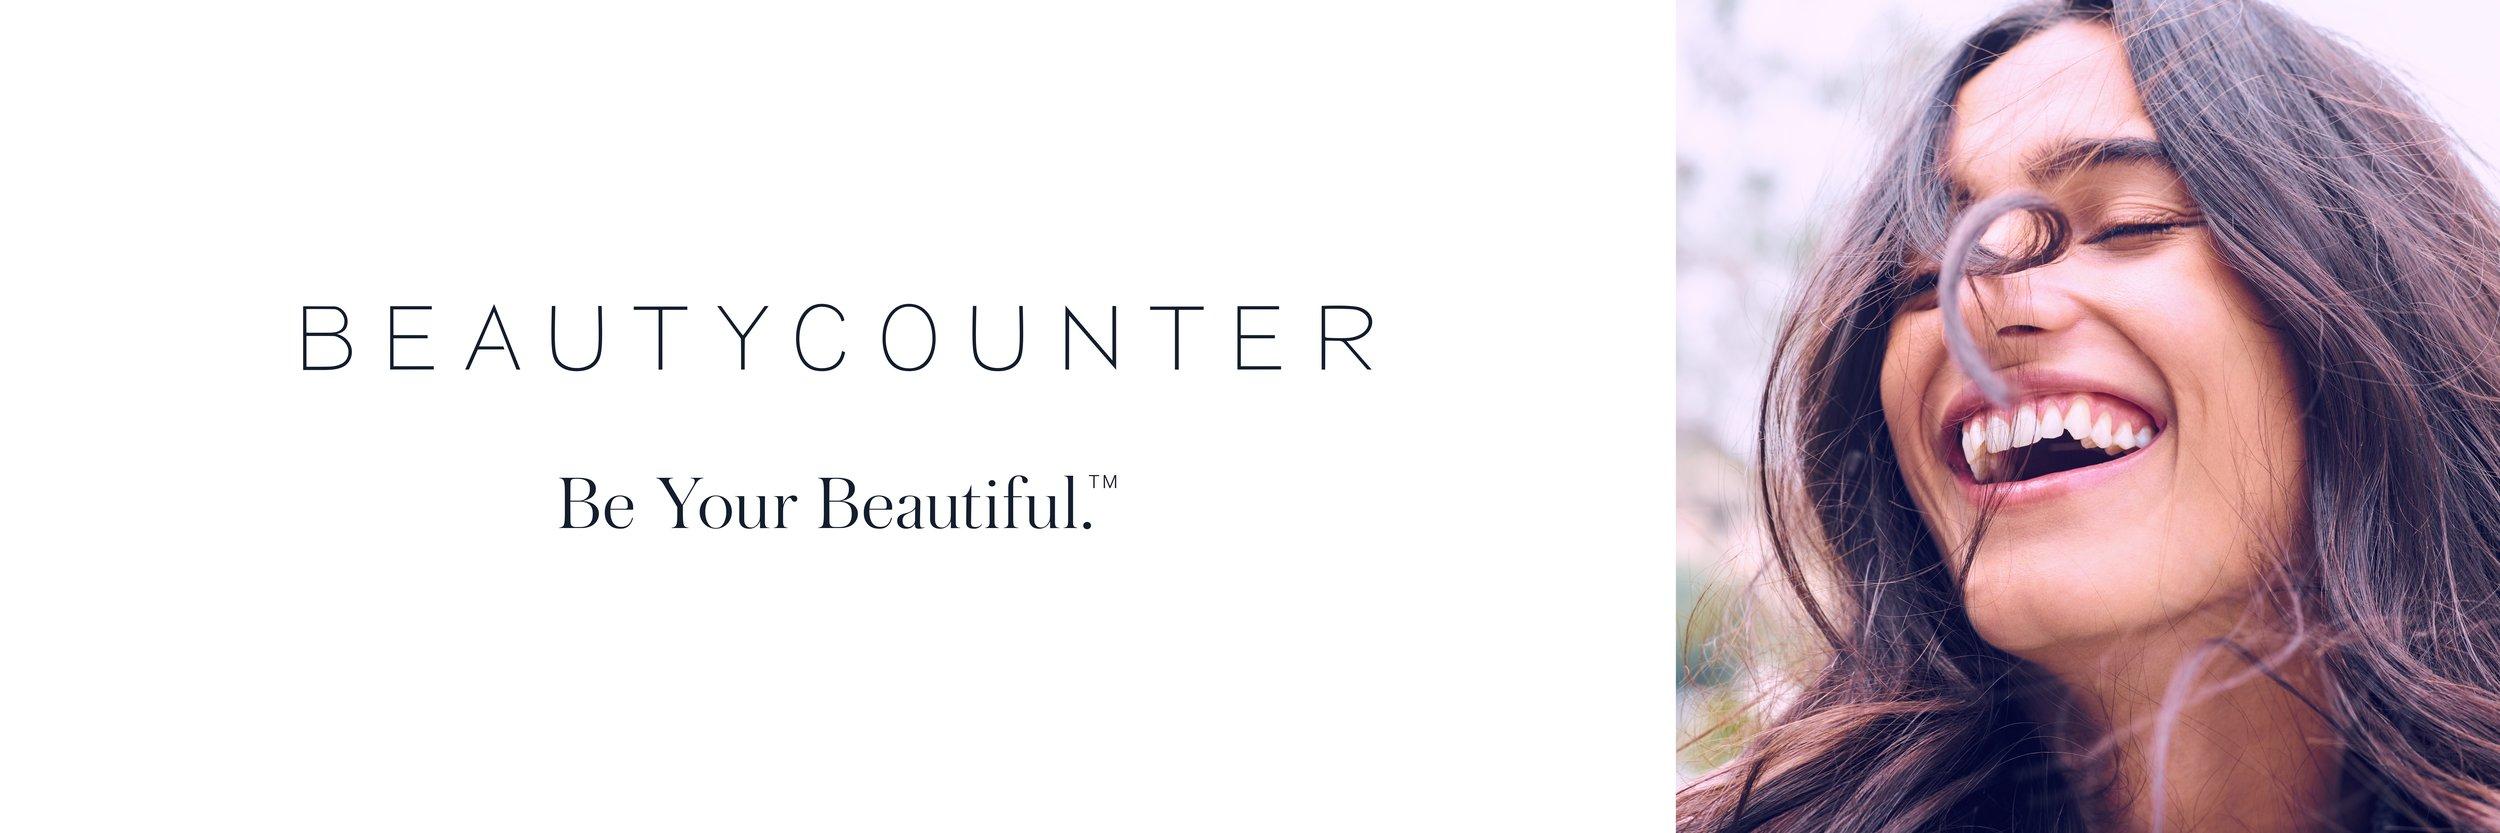 beautycounter review banner